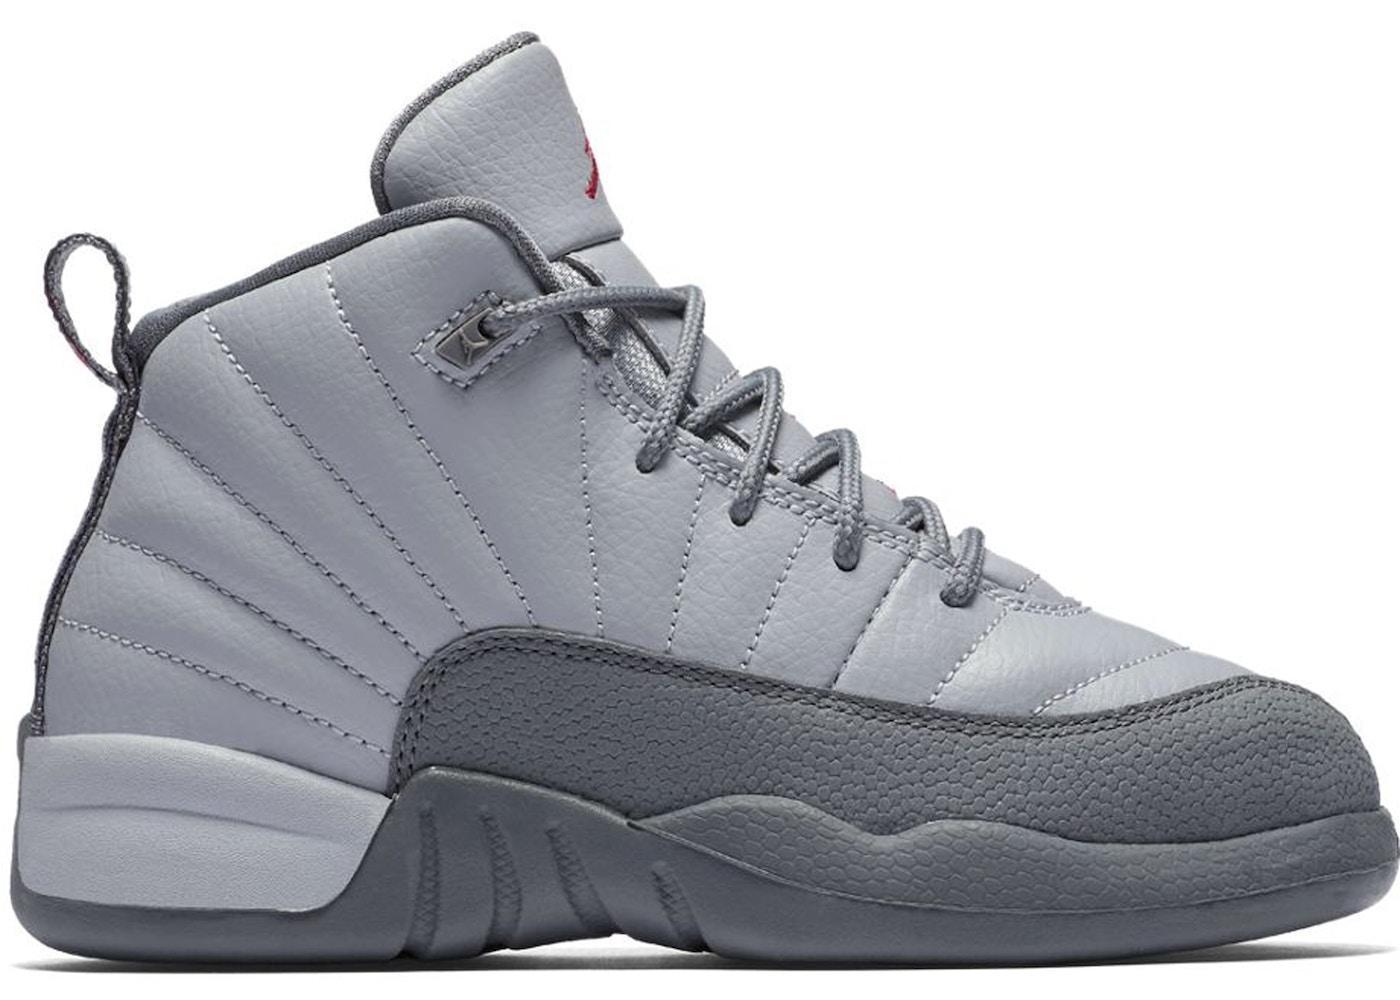 bf781ae6c7e8 Jordan 12 Retro Wolf Grey Vivid Pink (PS) - 510816-029